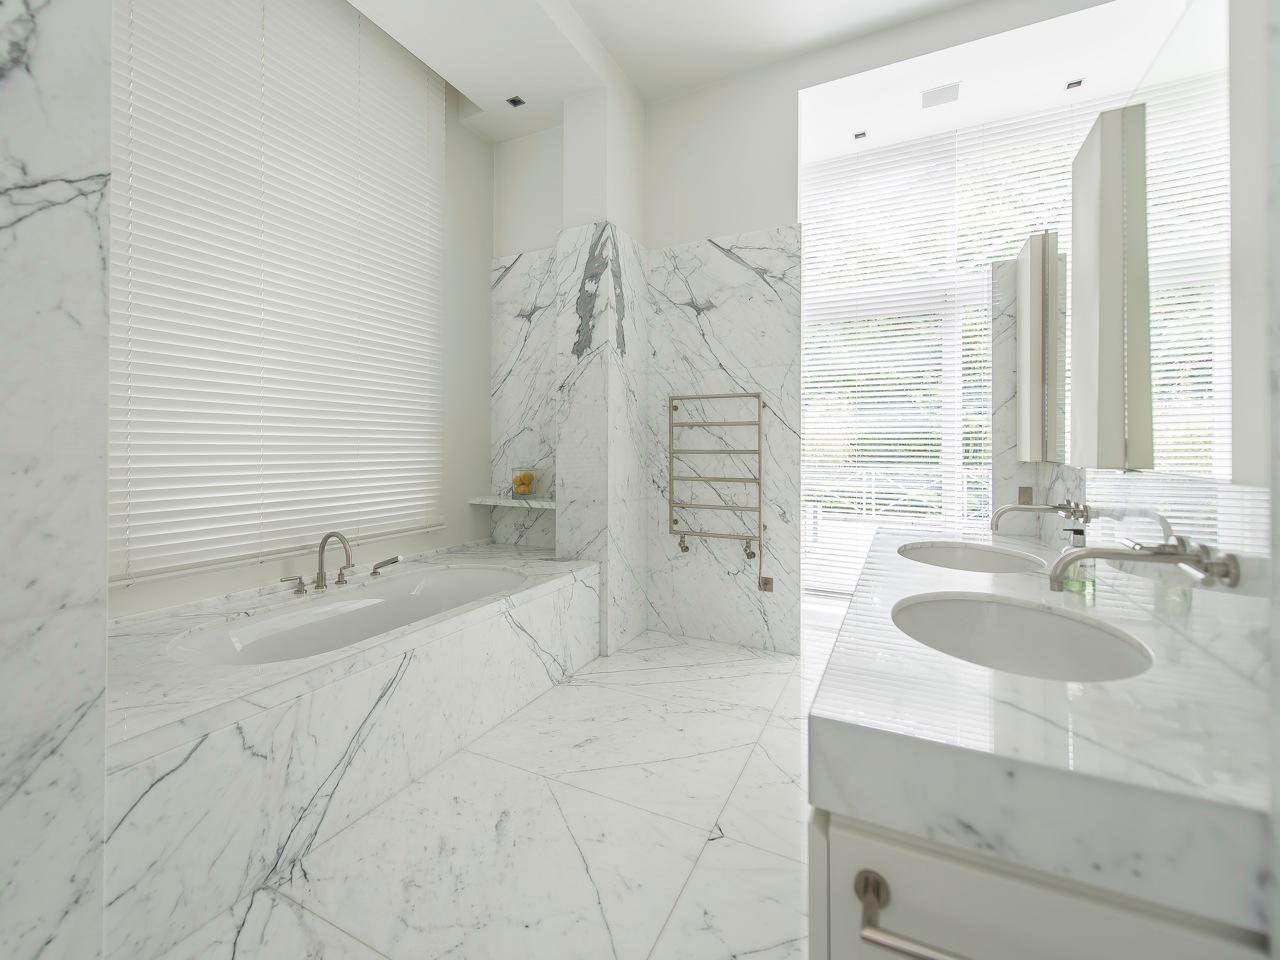 Chic Elegant Apartment in Brussels With Bright Interiors-17